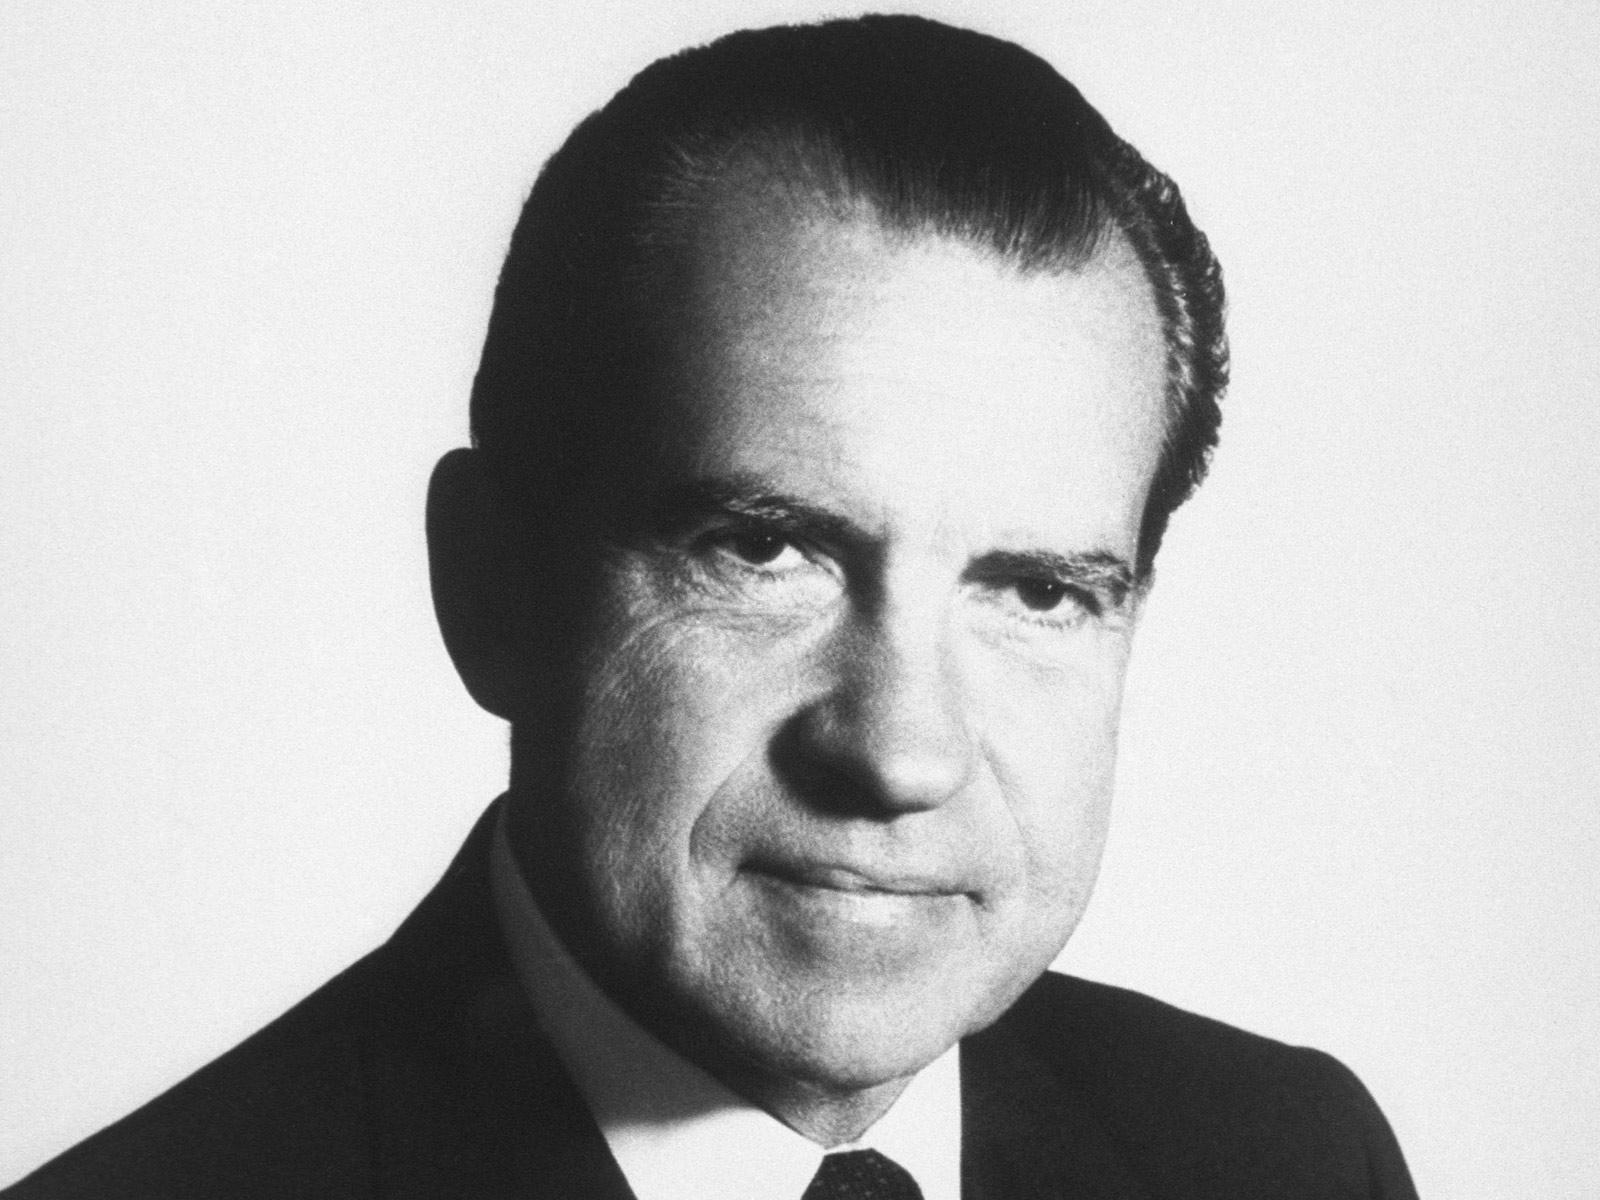 Richard Nixon Latest Wallpaper